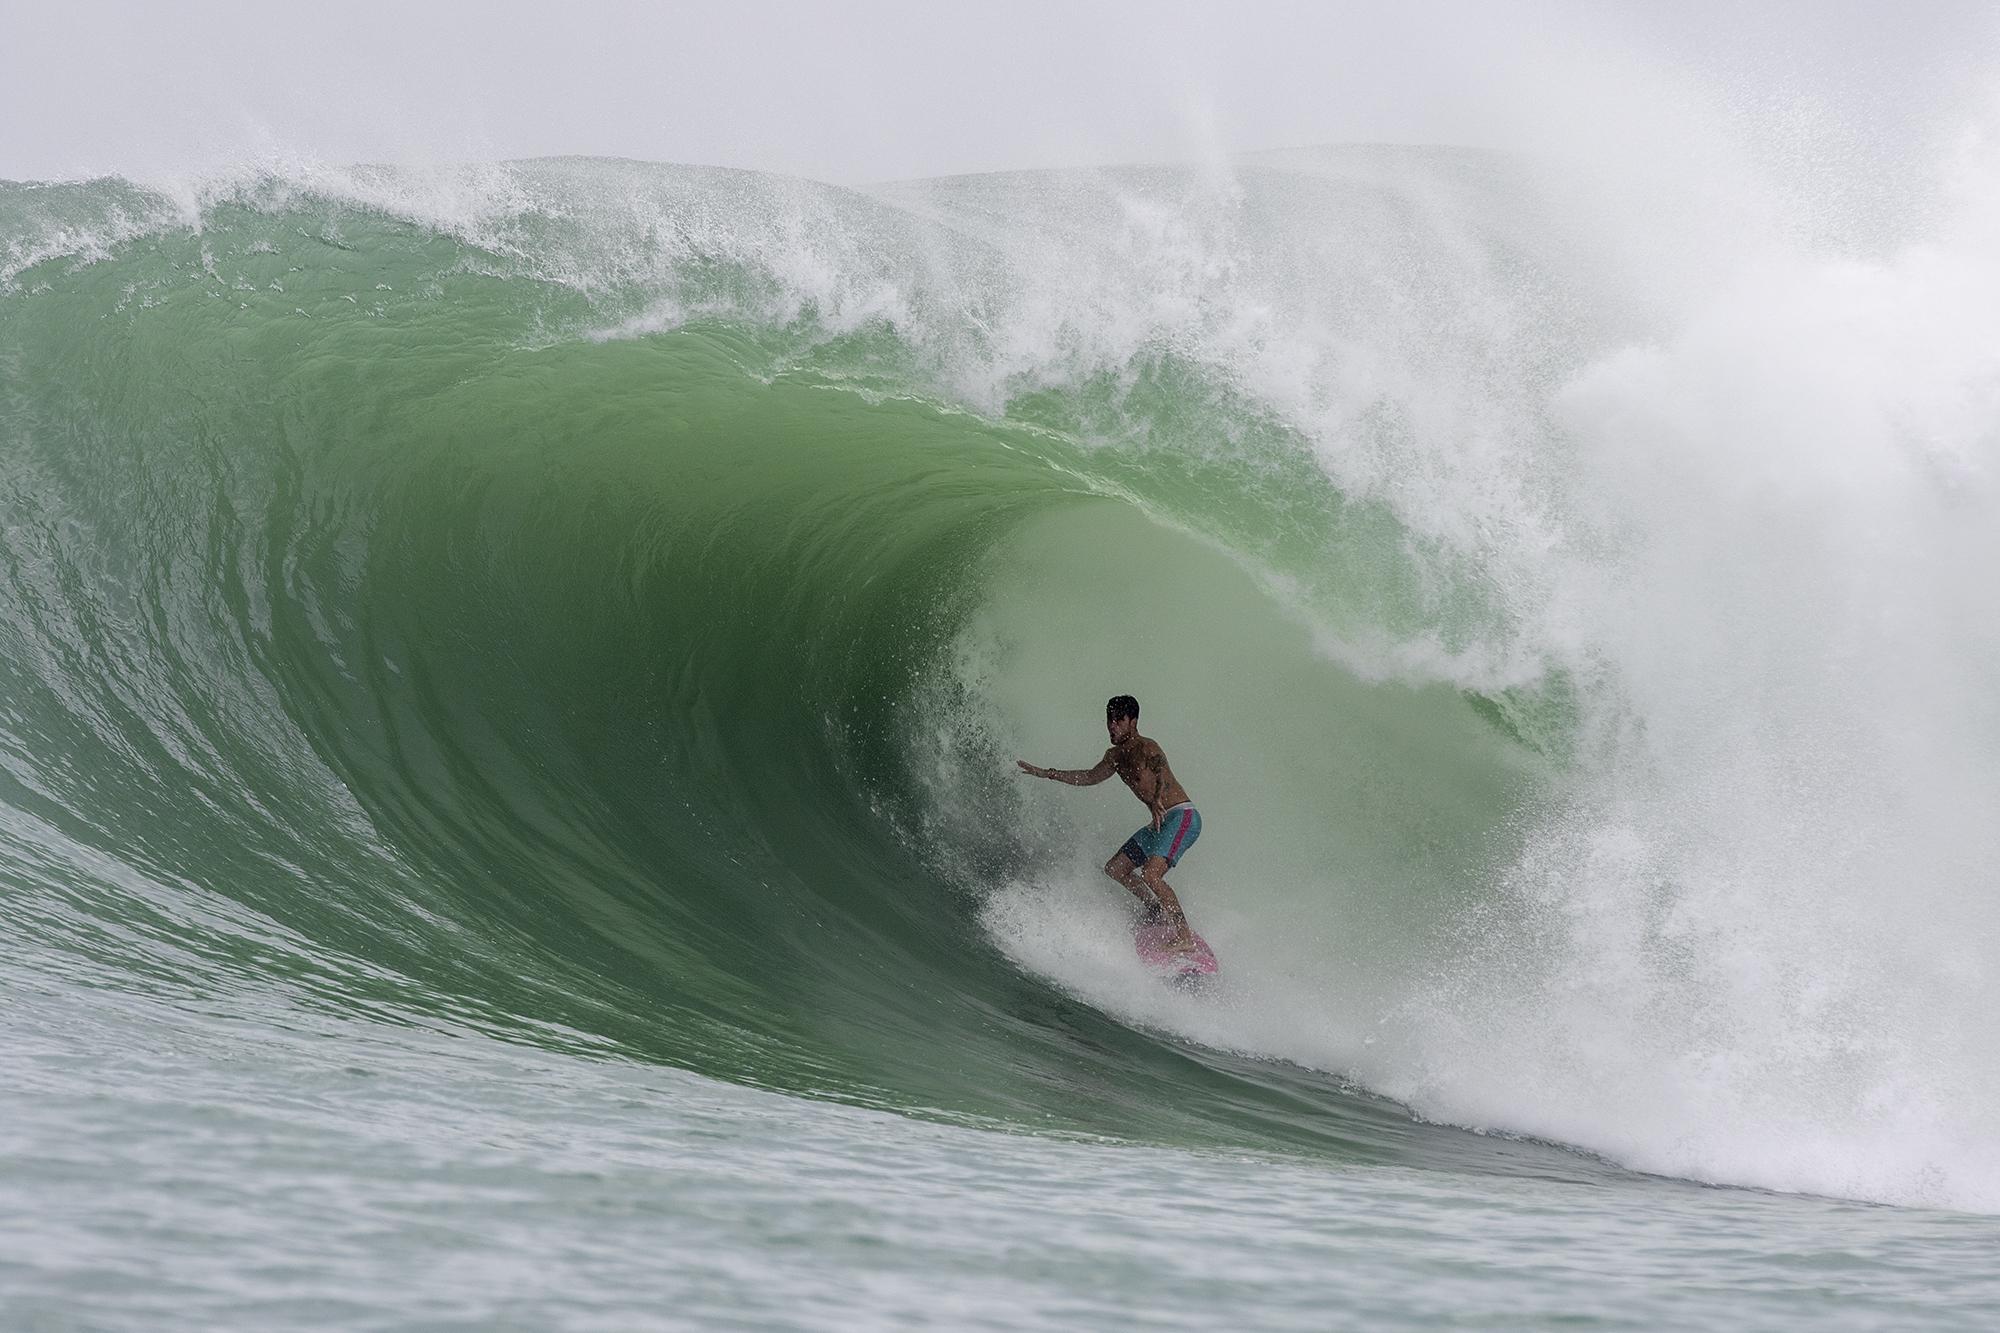 Panama, Bocas del Toro, Silverbacks, Luke Davis, Red Frog Bungalows, Koa Smith, Michael Dunphy, Andrew Jacobson, Travel,